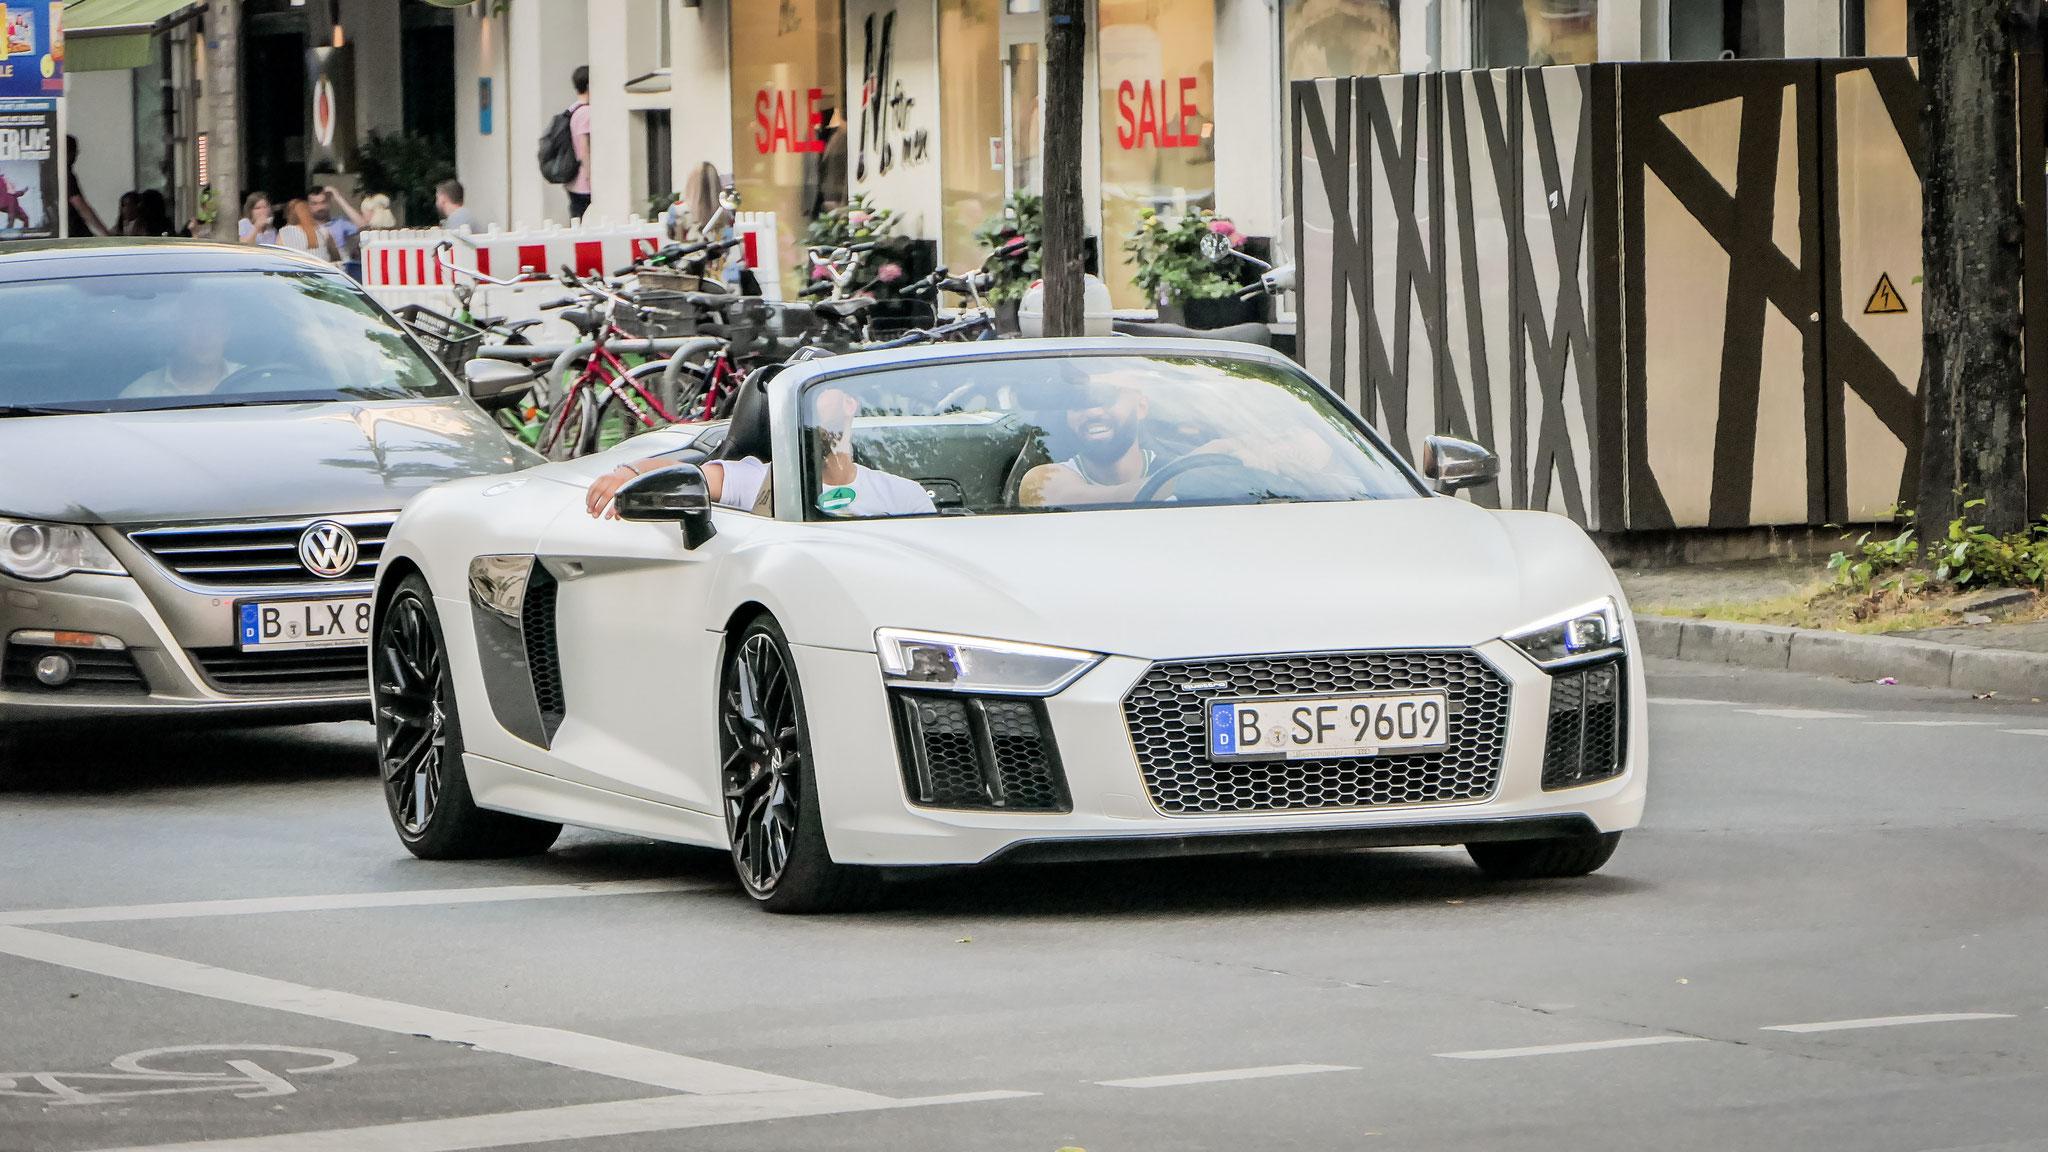 Audi R8 V10 Spyder - B-SF-9609